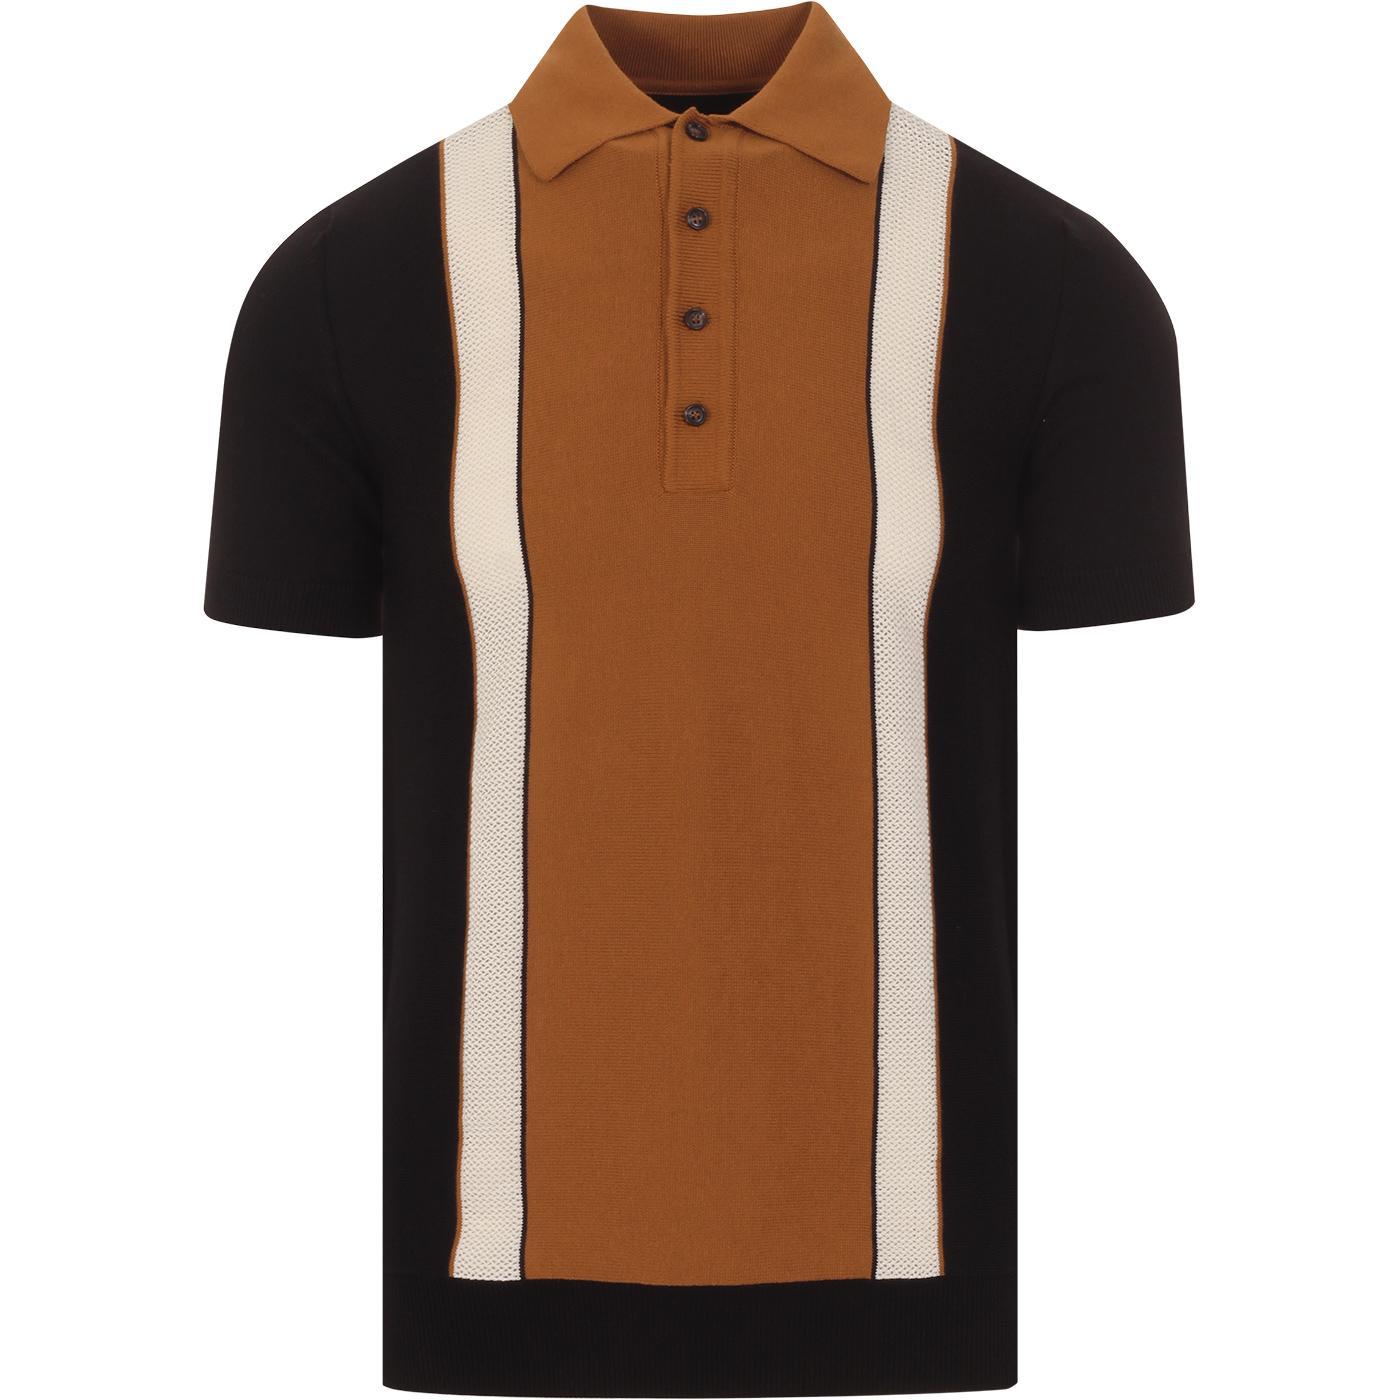 SKA & SOUL Dobby Texture Stripe Mod Knit Polo (B)